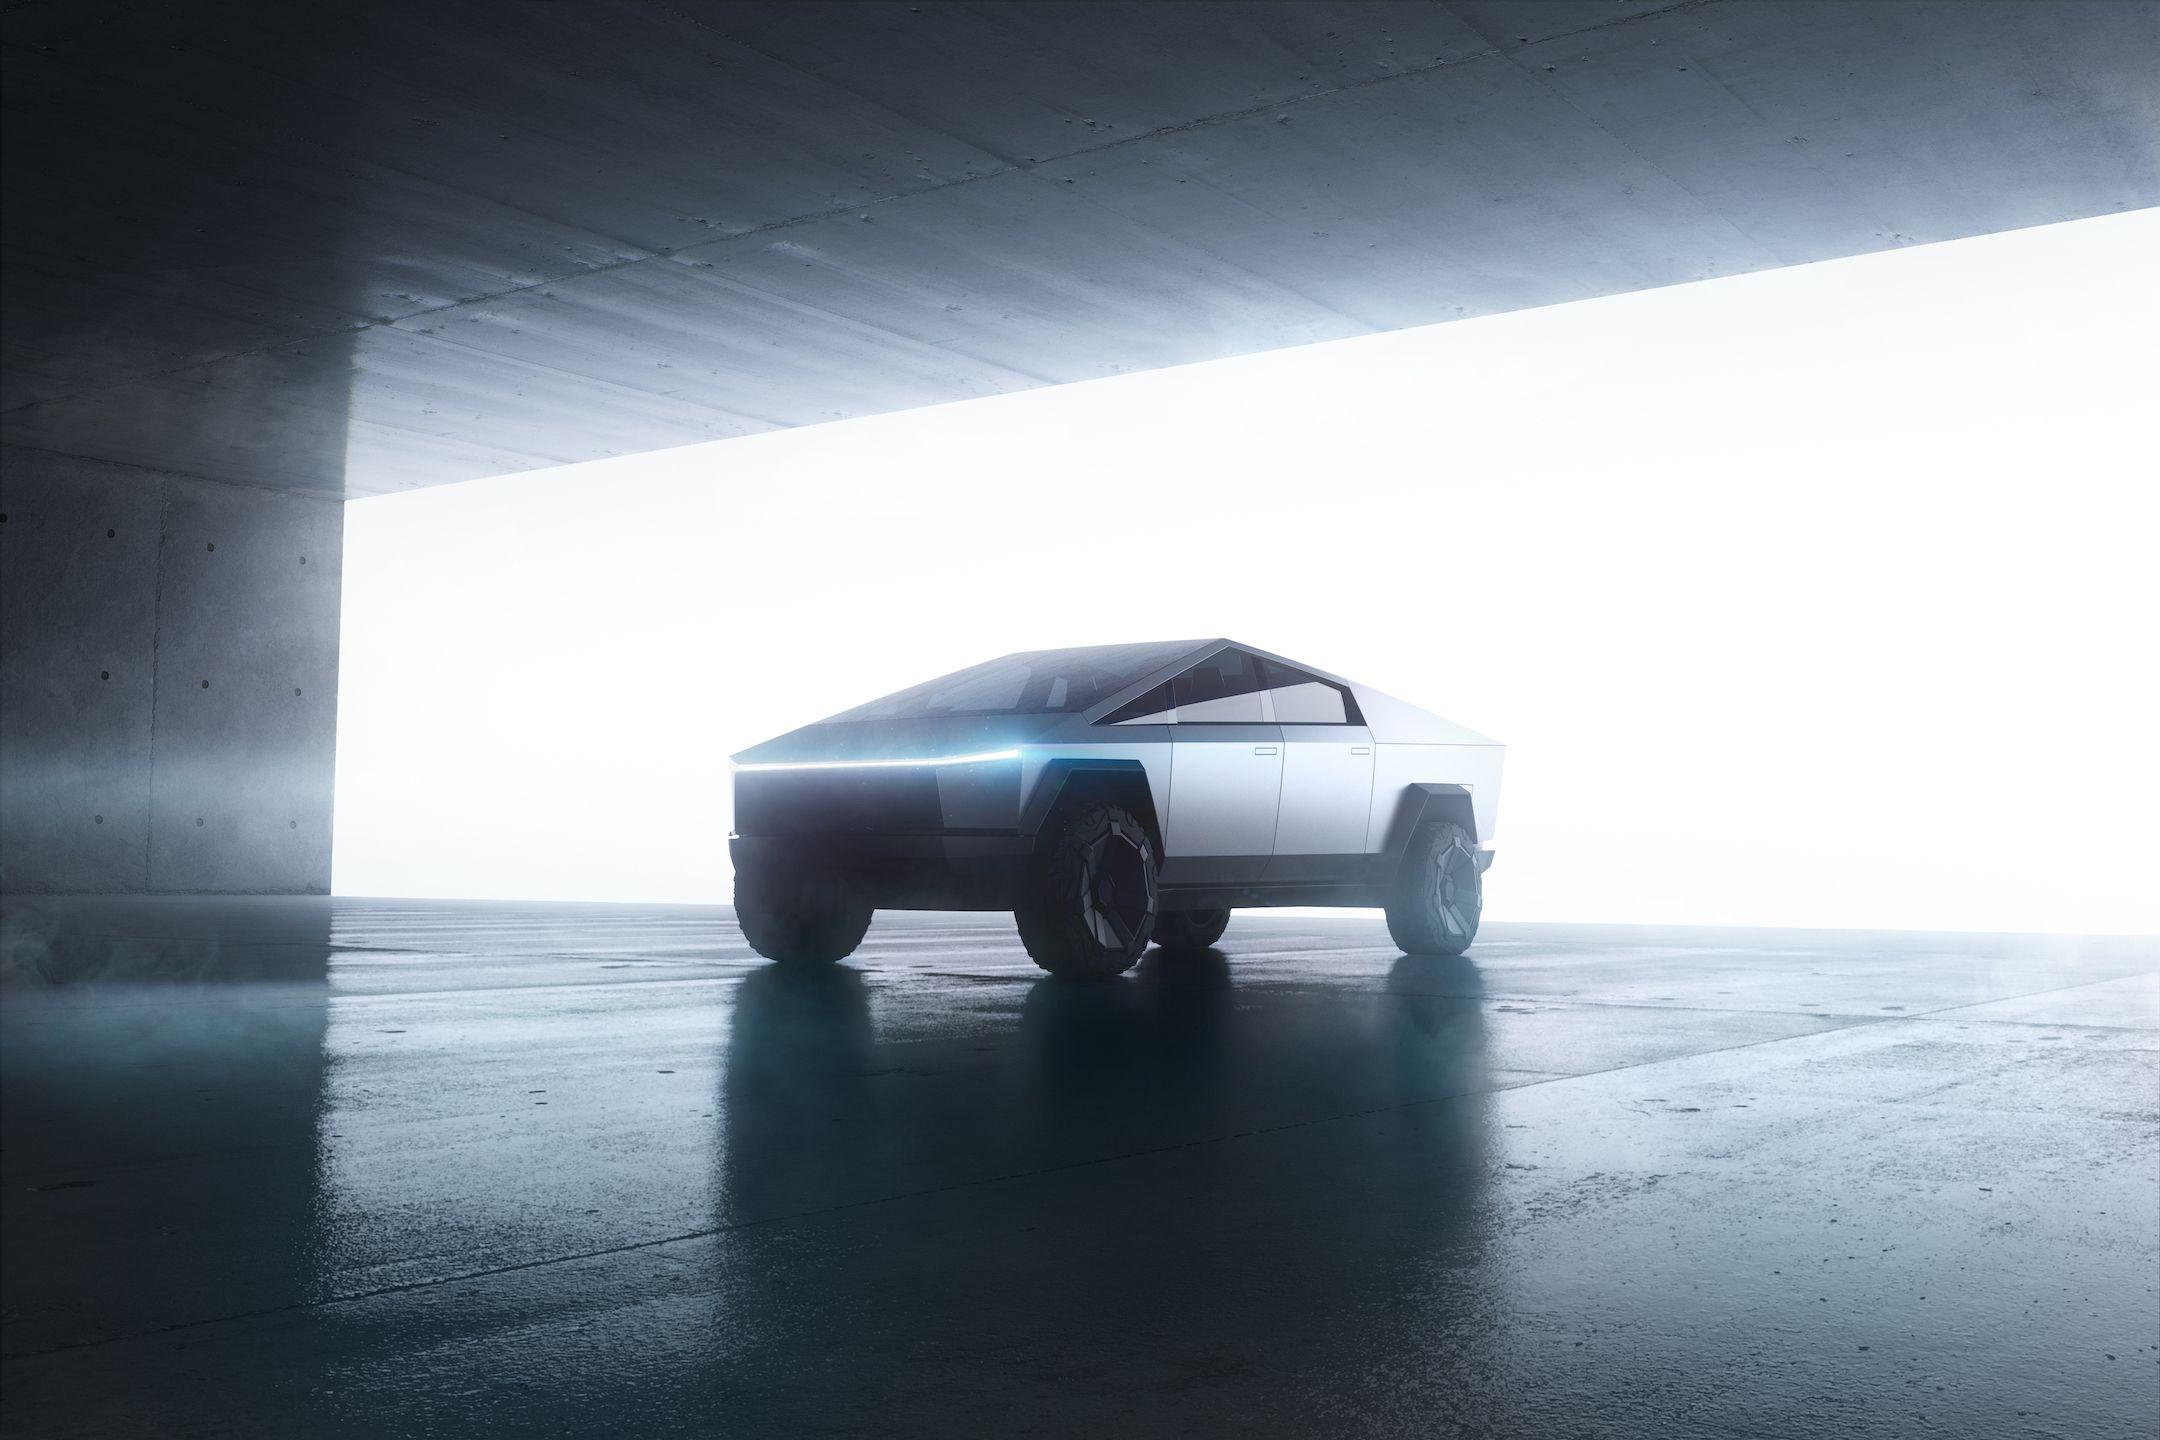 Итоги II квартала Tesla и Daimler, план Mitsubishi и «полуробот» 379204 - Kapital.kz